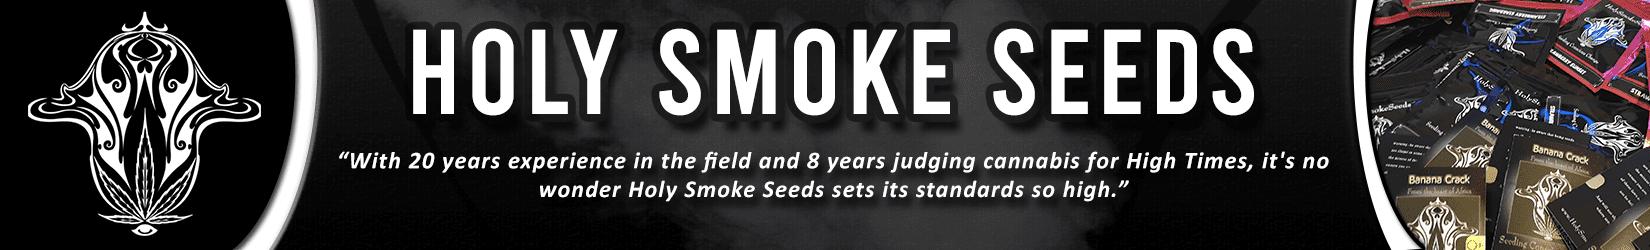 Cannabis Seeds Breeder - Holy Smoke Seeds